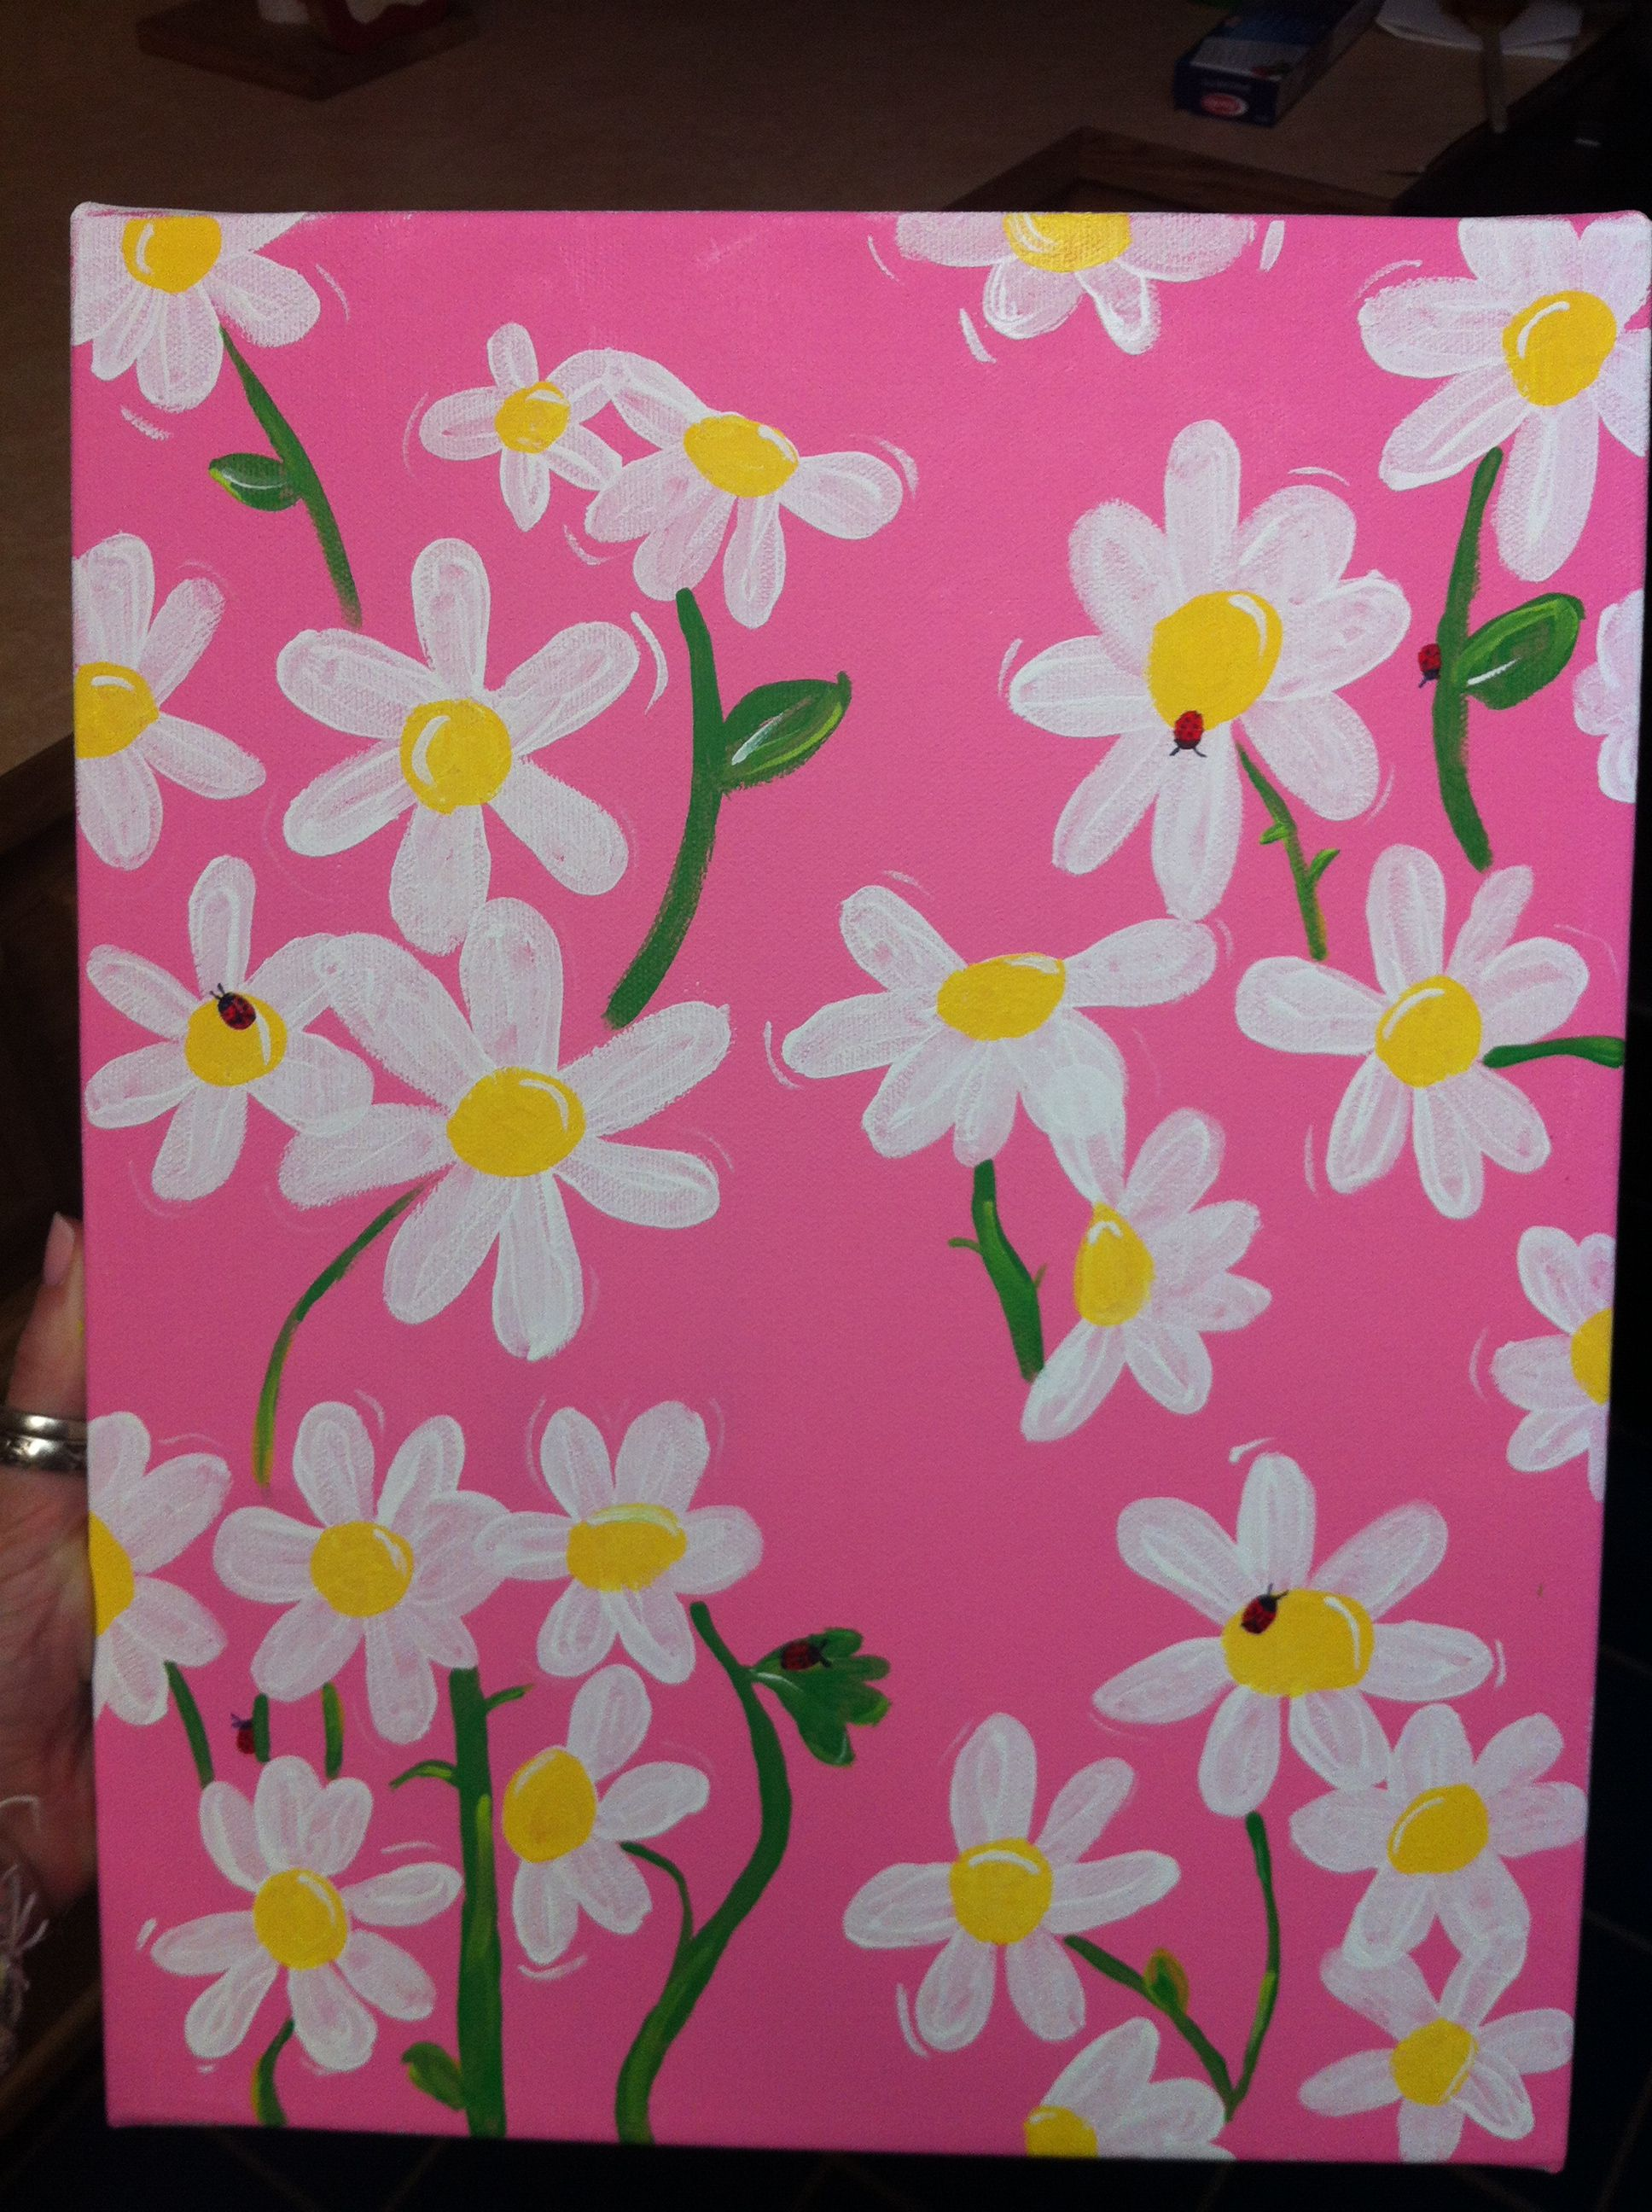 Lilly Pulitzer Daisy Painting | Craft Ideas | Pinterest